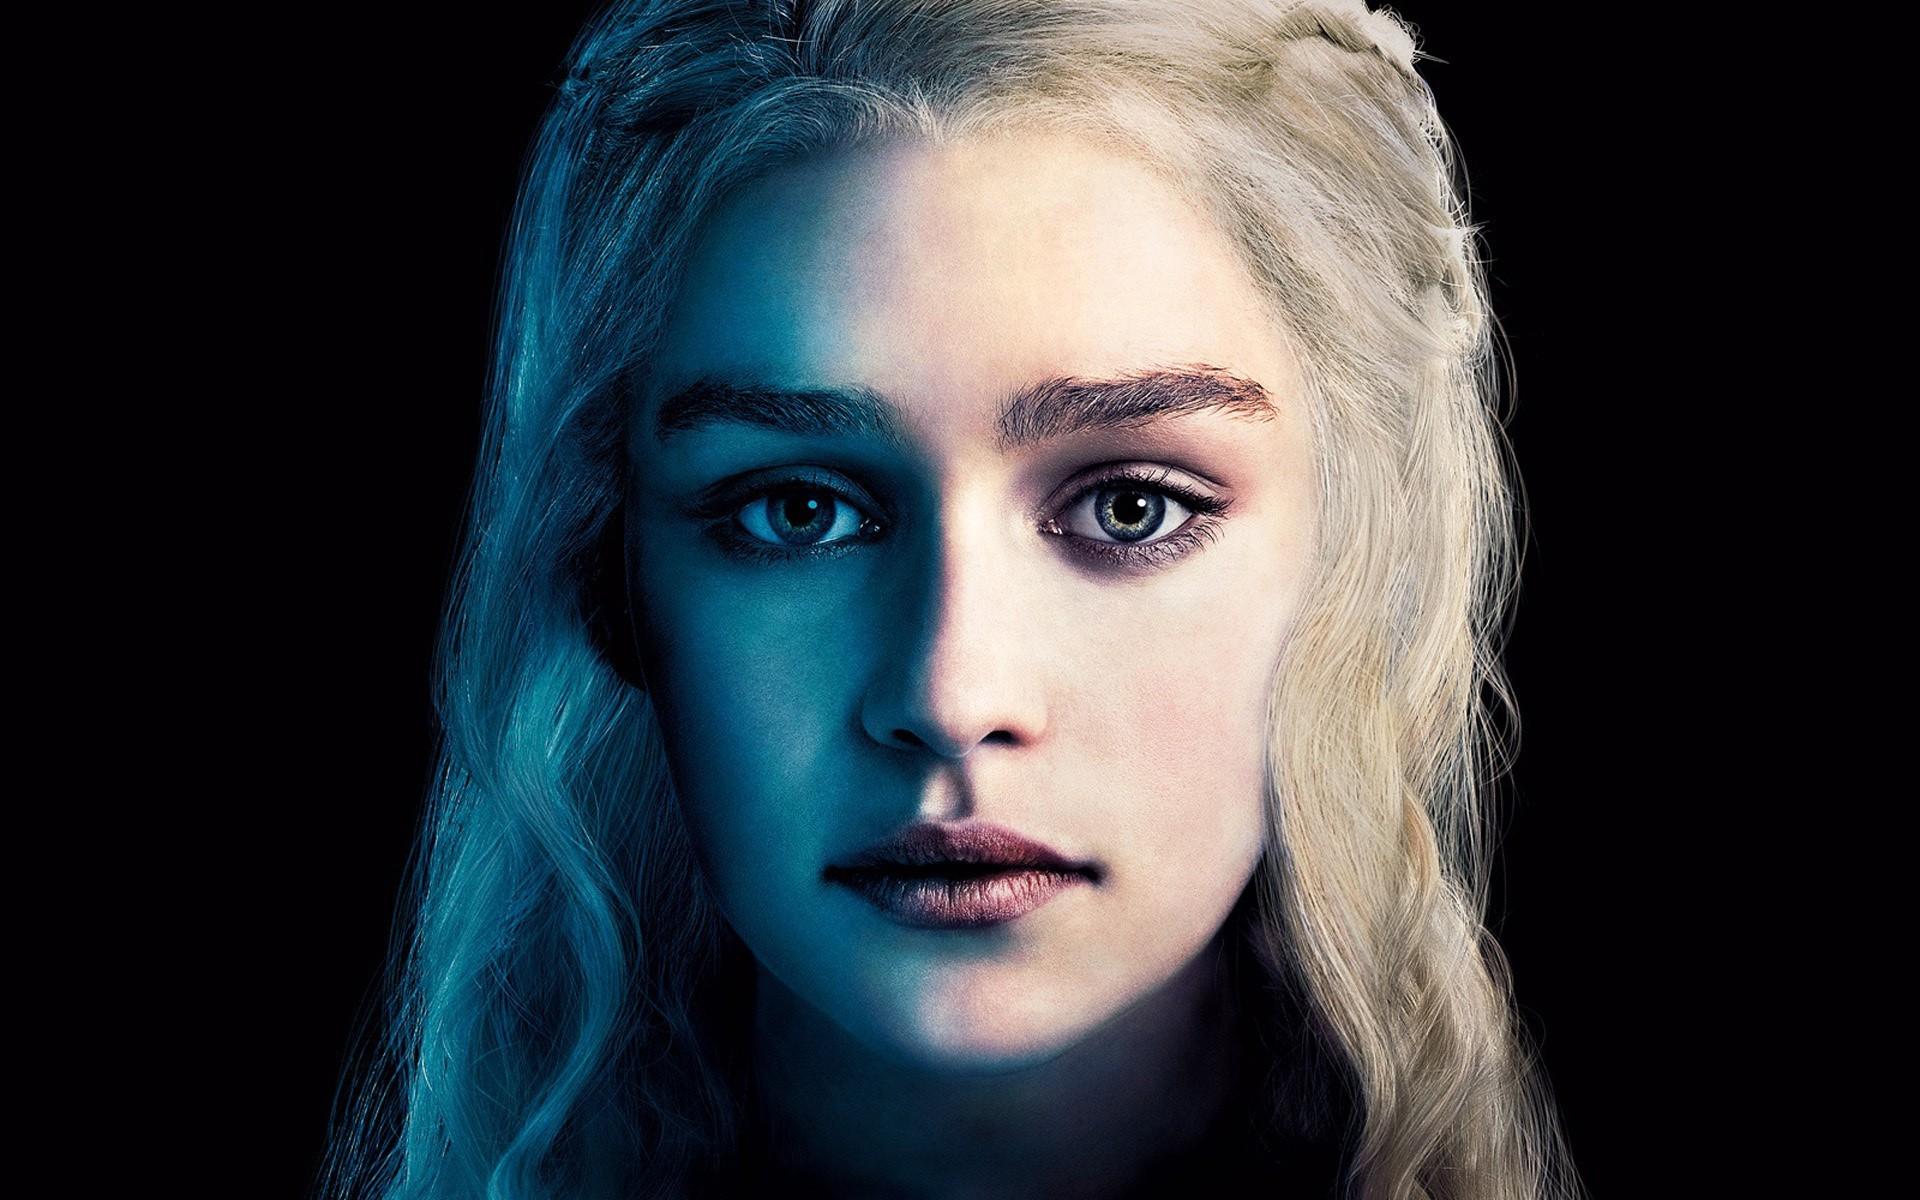 Daenerys-Targaryen-personnage